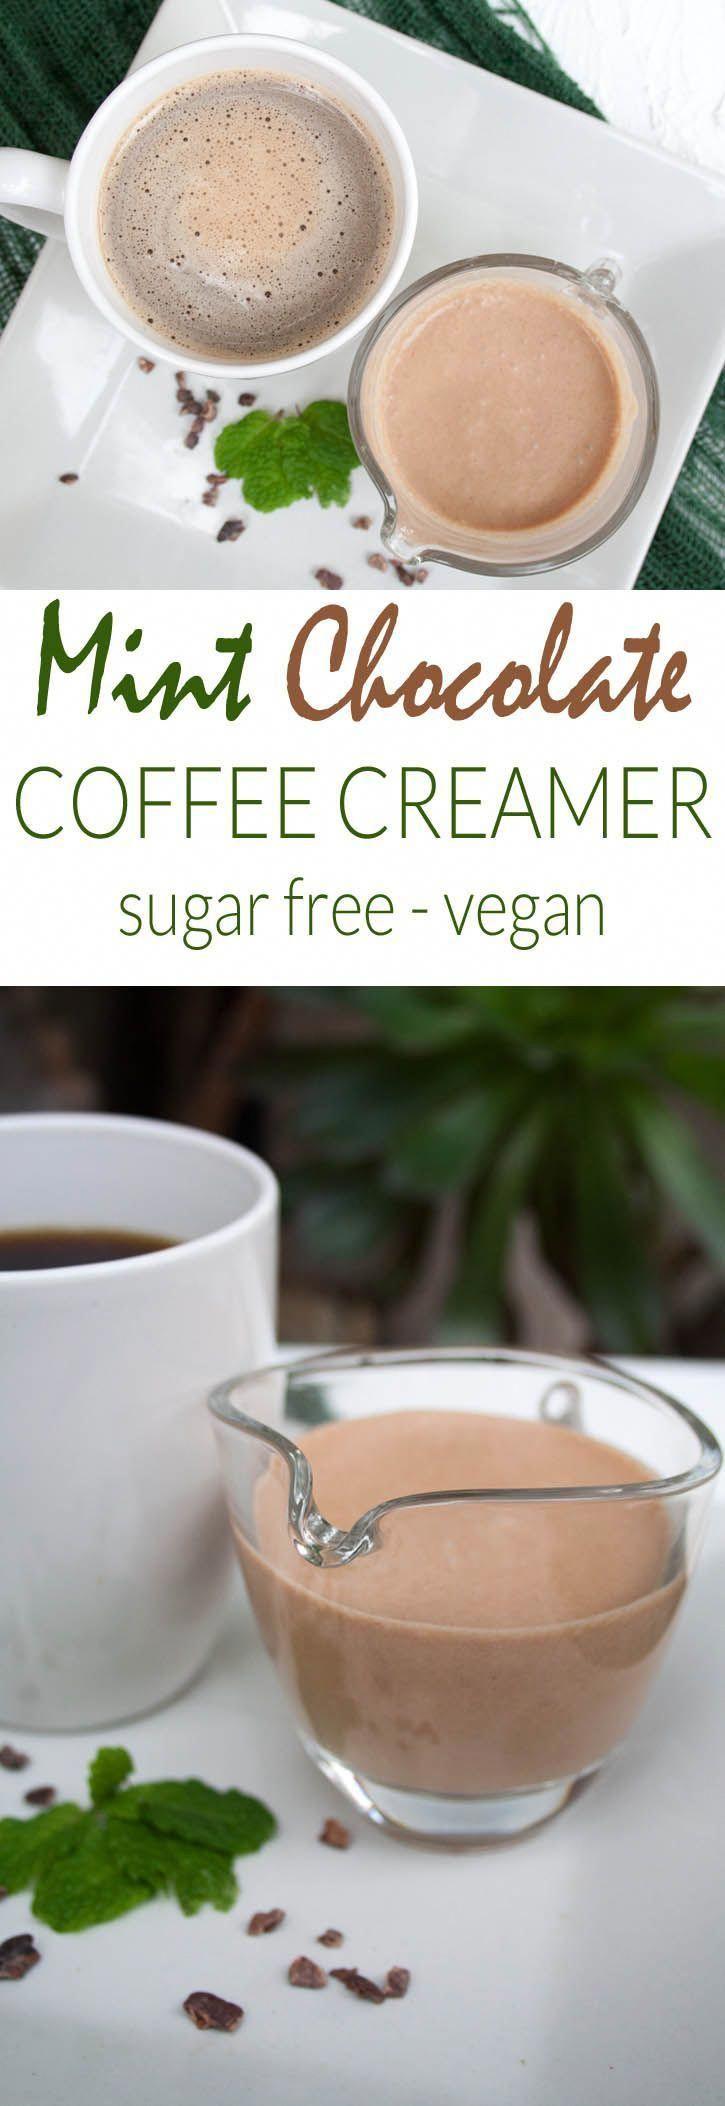 Mint Chocolate Coffee Creamer (vegan, gluten free, sugar